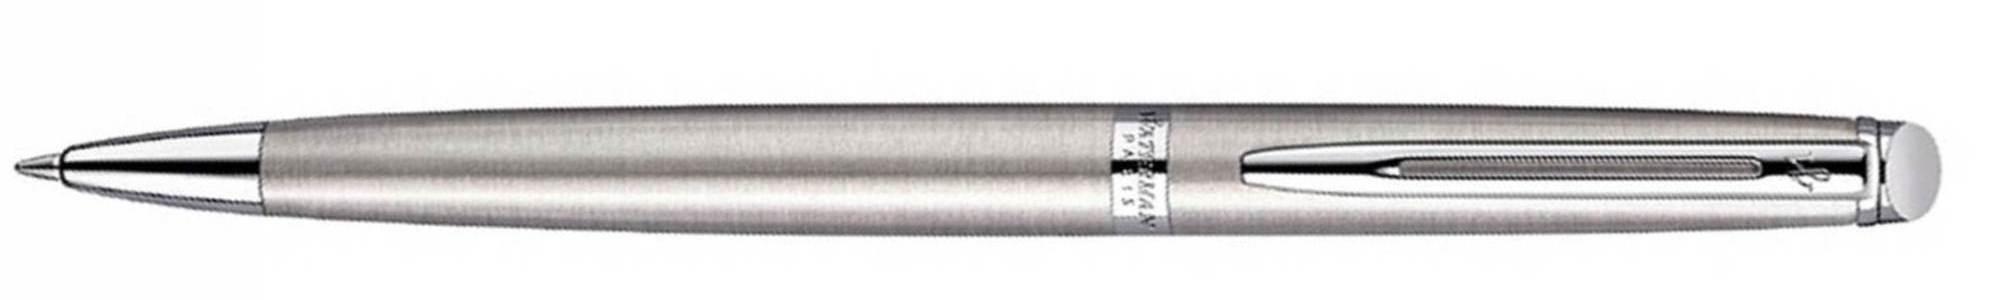 Długopis Waterman HEMISPHERE – 05160